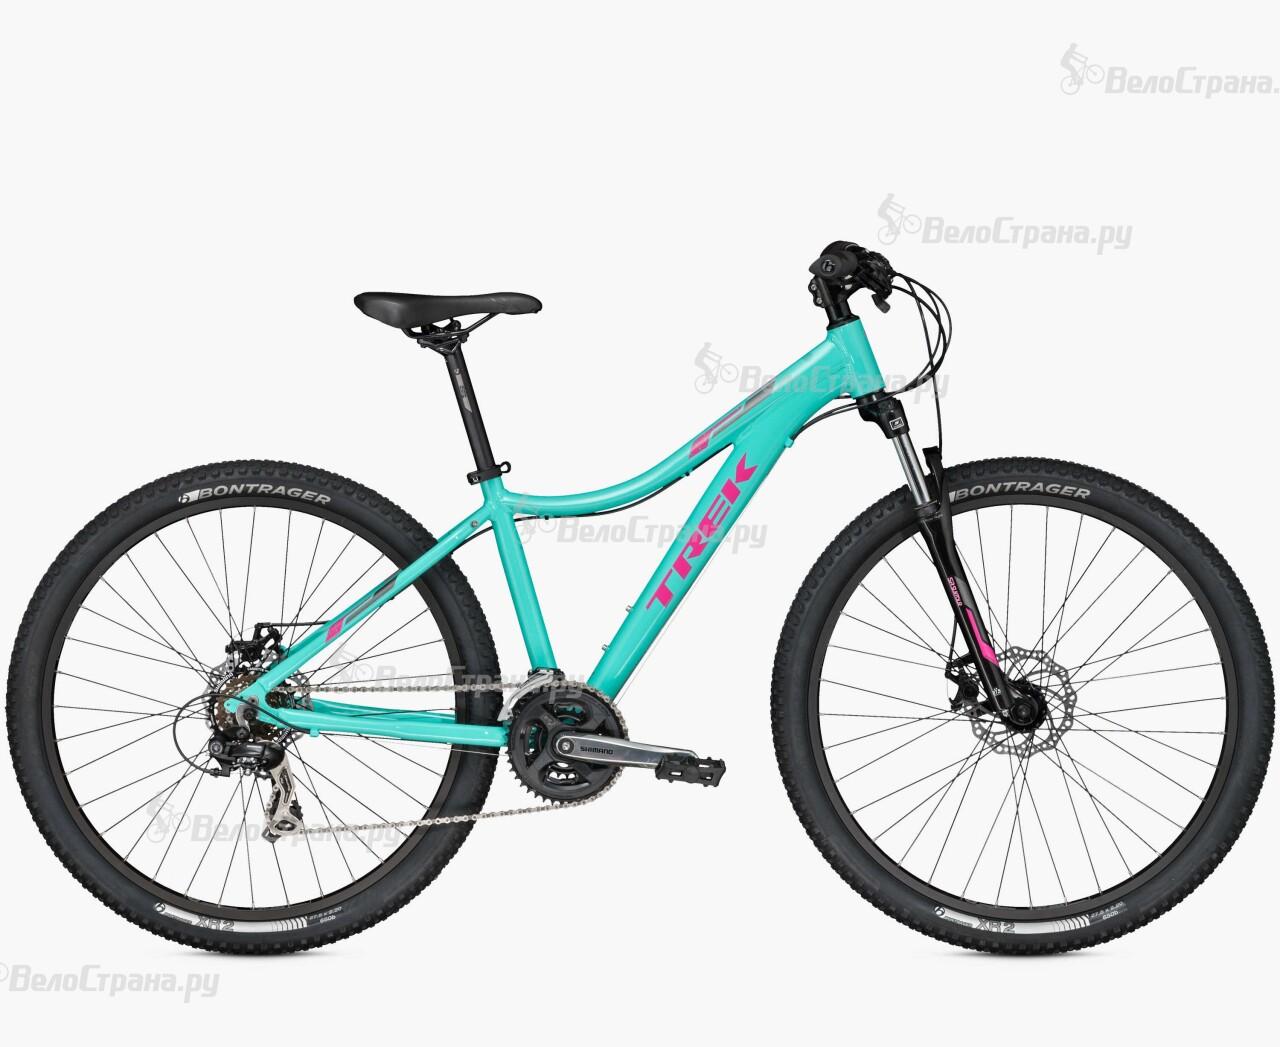 все цены на Велосипед Trek Skye S Women's 27.5 (2016) онлайн